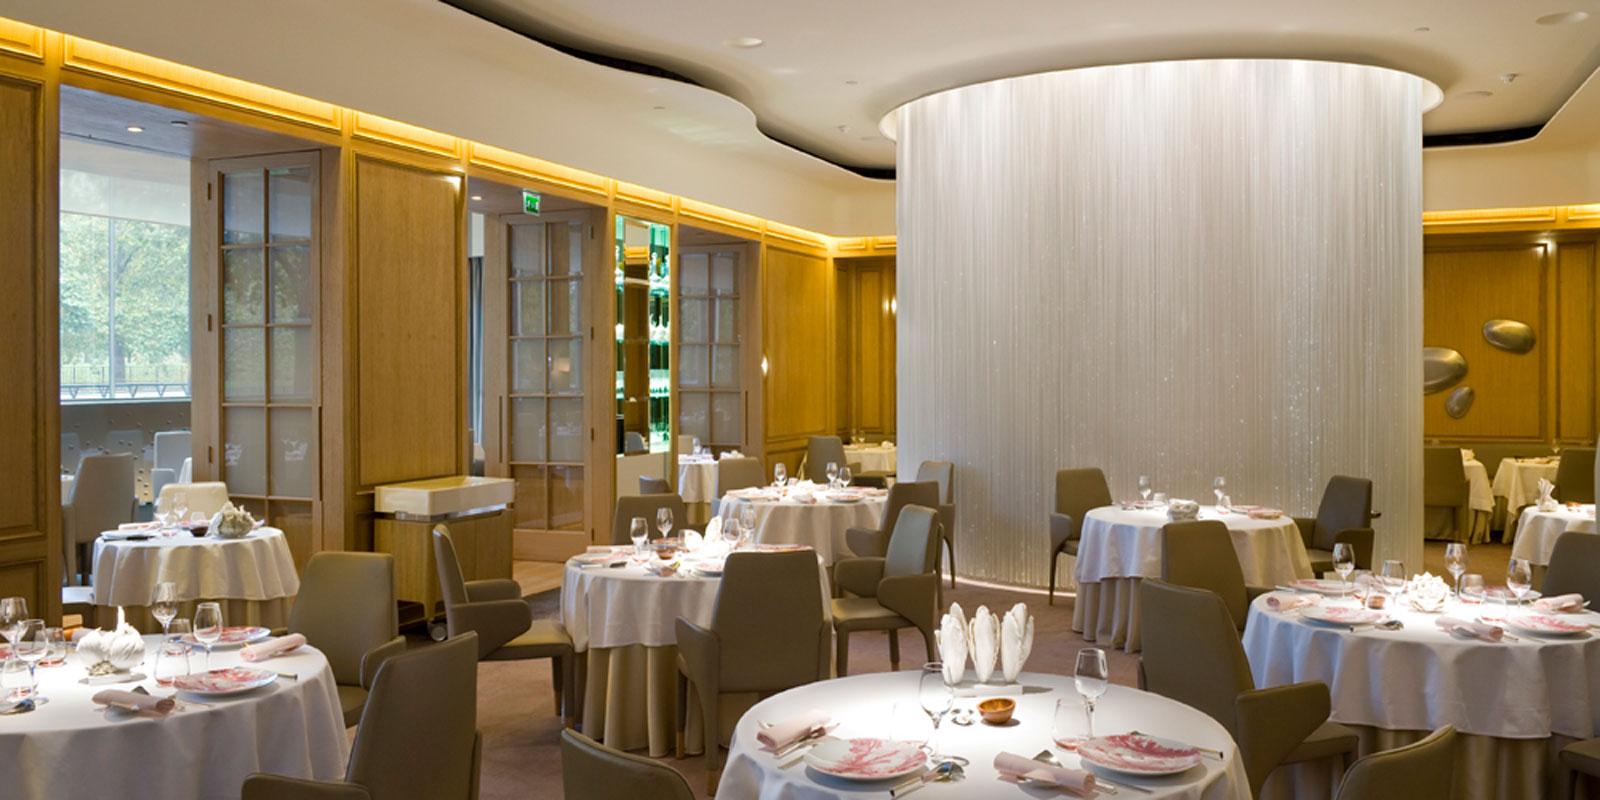 Ресторан Alain Ducasse at The Dorchester (Великобритания)